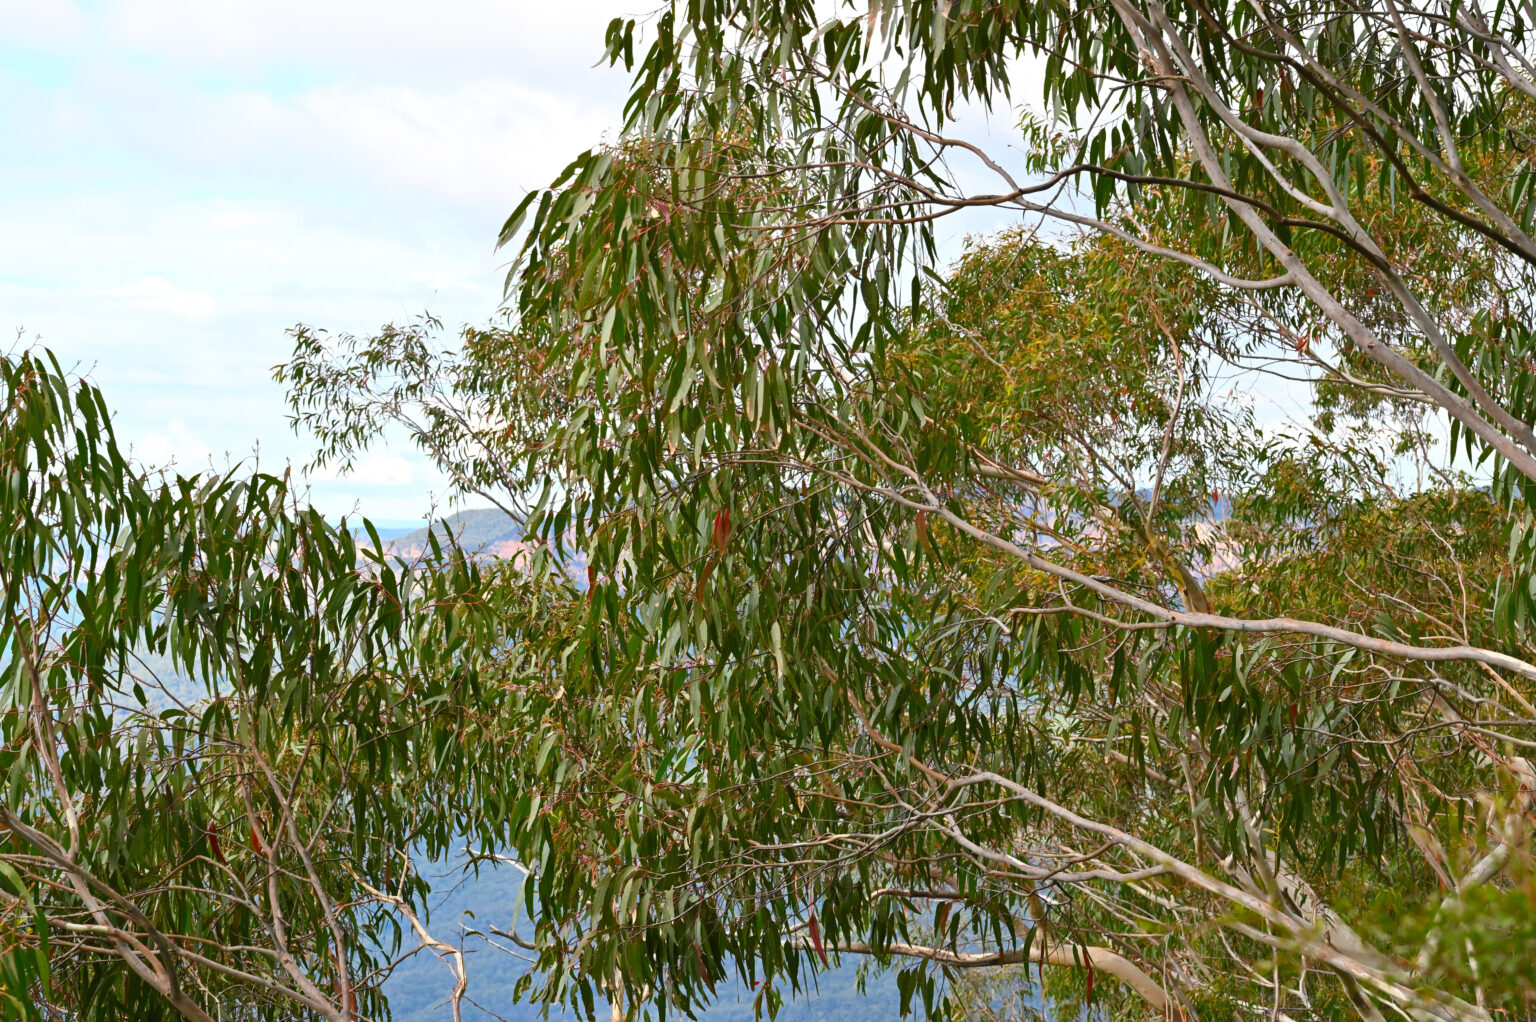 Eucalyptus trees - Jamison Valley